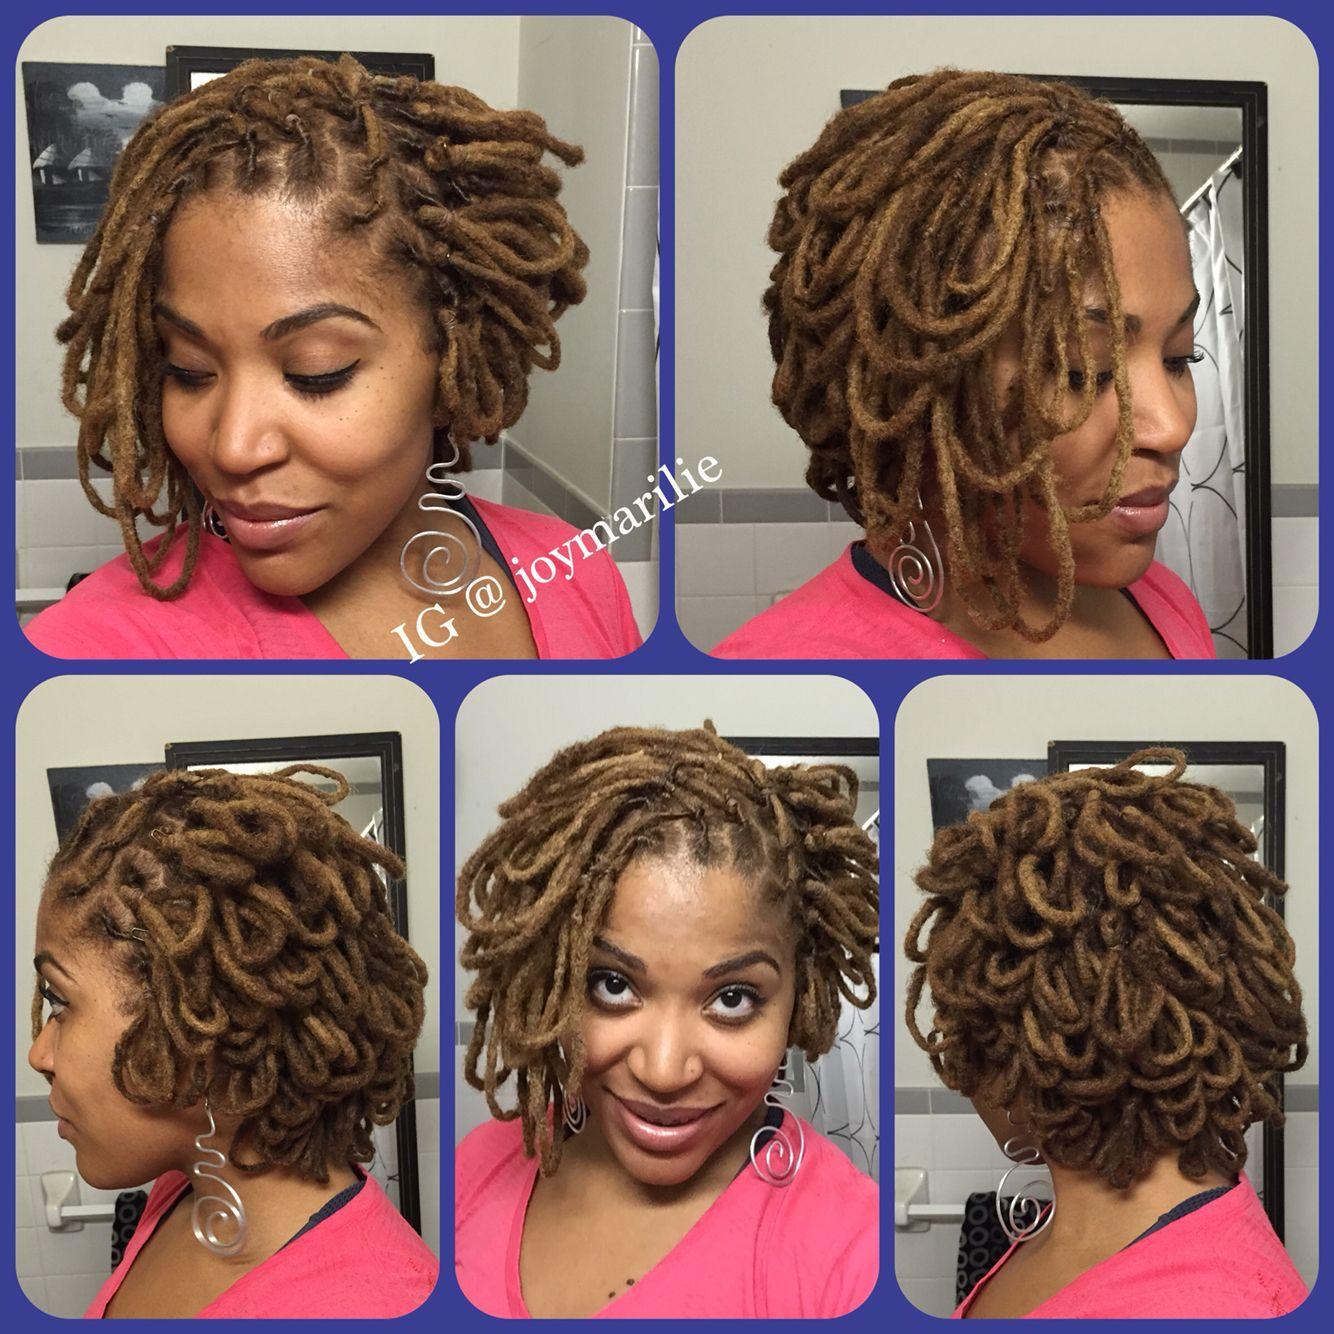 Asymmetrical Loc Petal Bob Natural Hair Styles For Black Women Dread Hairstyles Dreadlock Styles